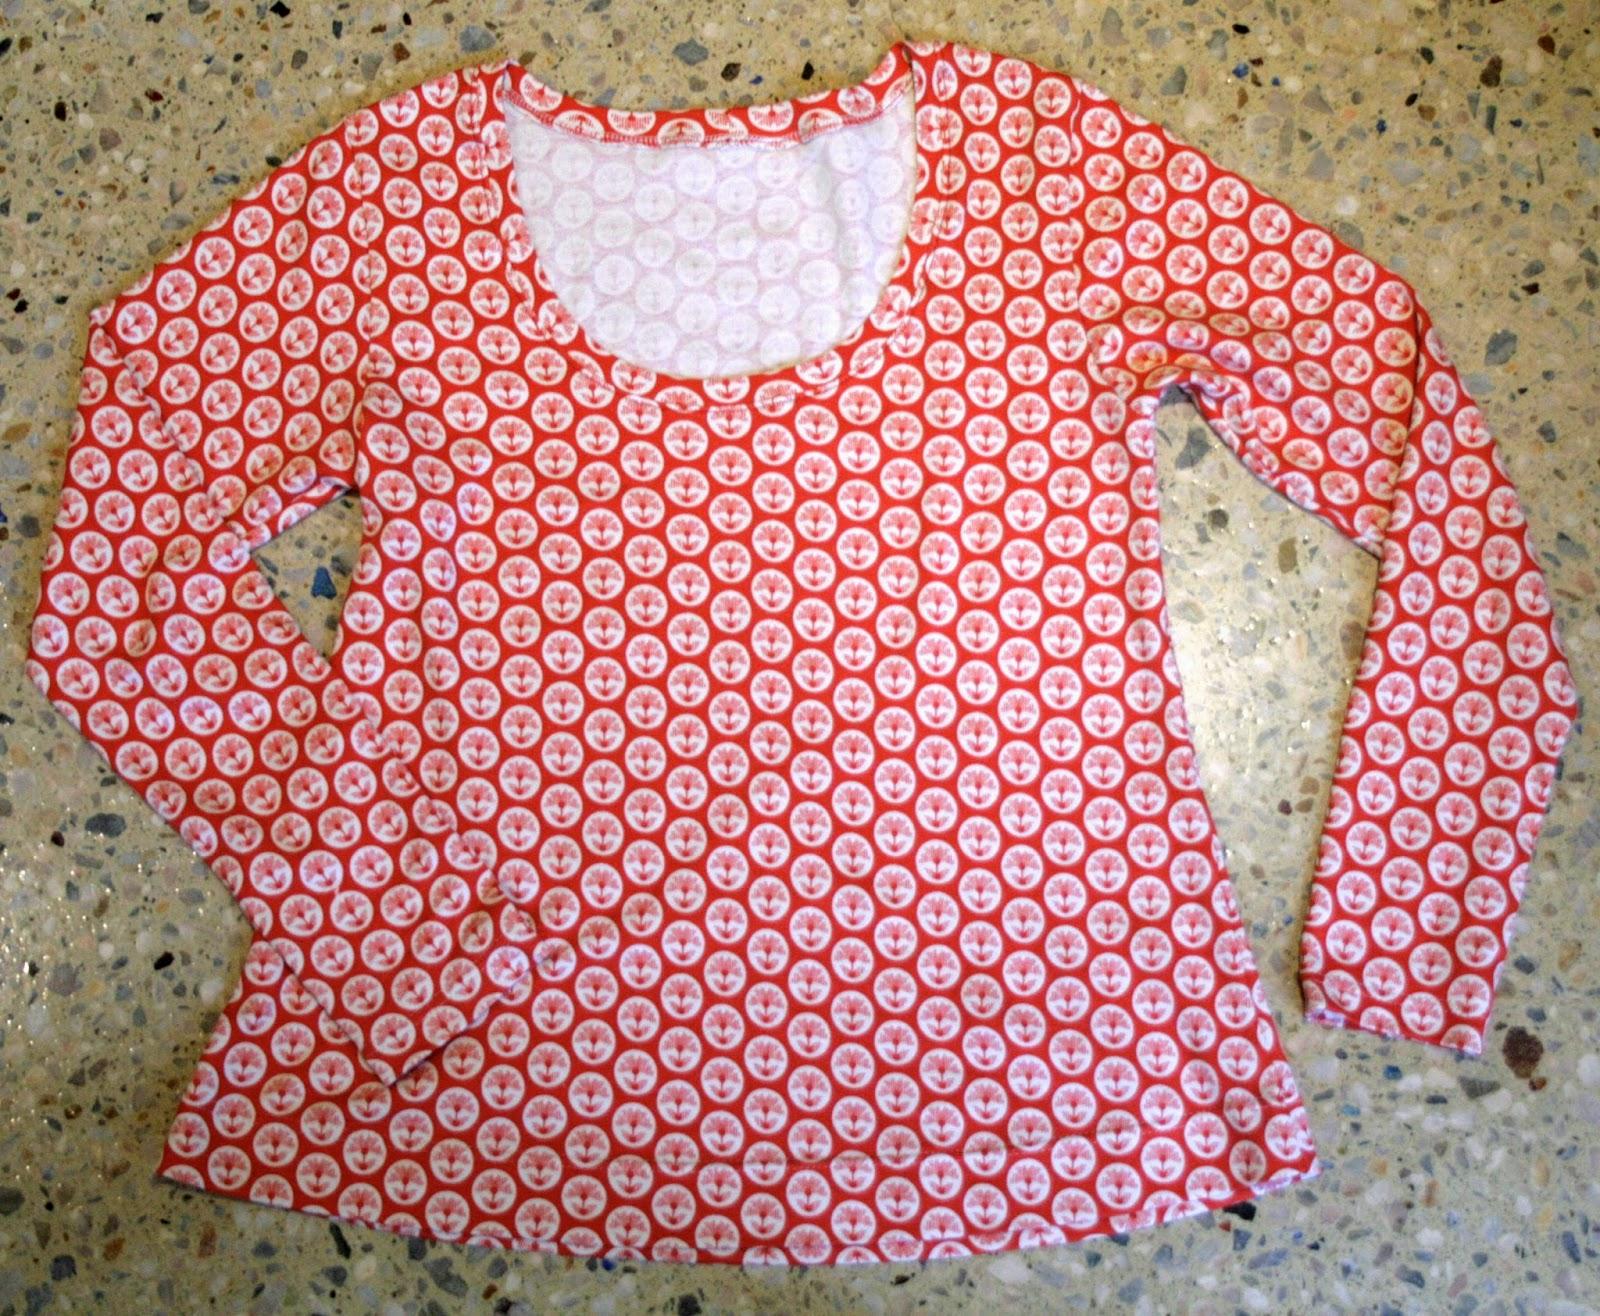 THE DRAPERY: Plantain top in Anna Maria Horner cotton interlock knit